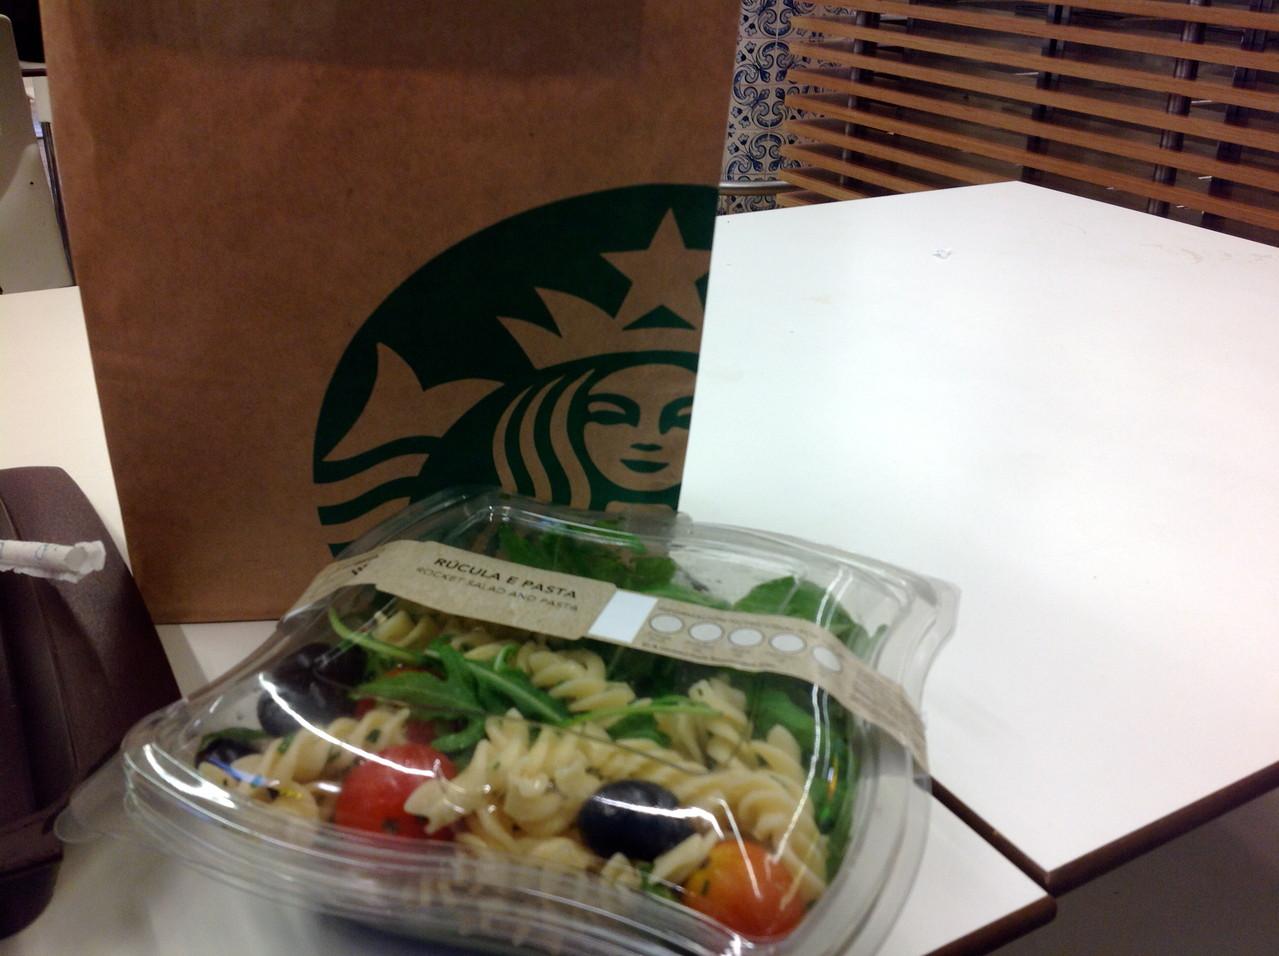 Salat aus Feldsalat, Fusselini, Oliven und Tomaten, Salz und Olivendressing